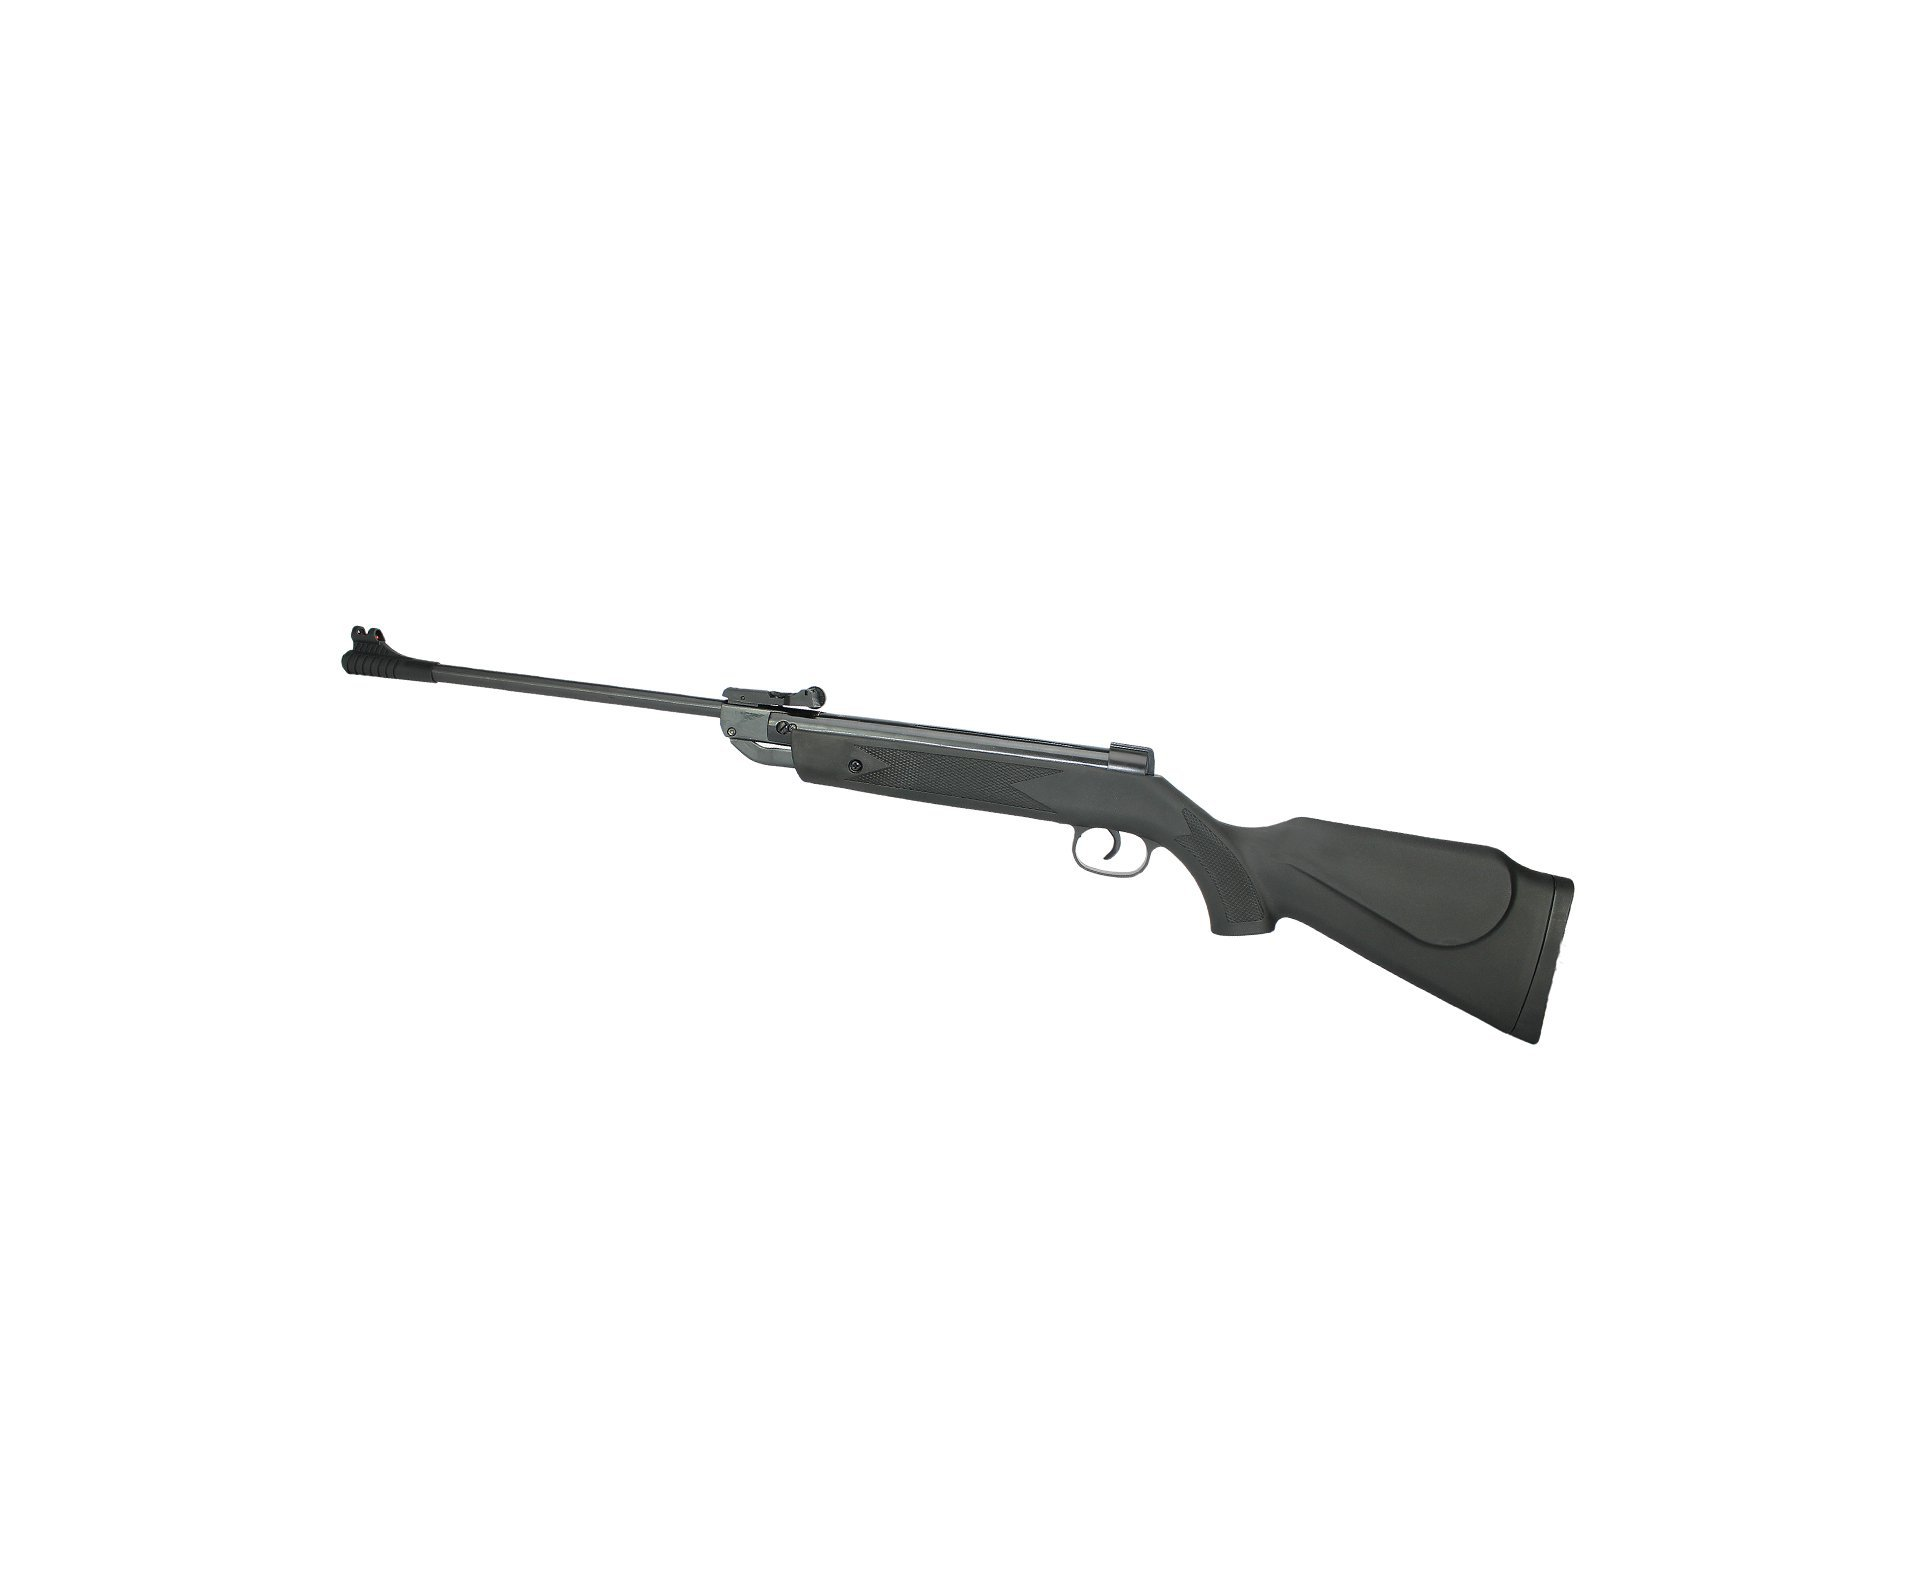 Carabina De Pressão Shadow Black Cal 5.5mm - Fixxar